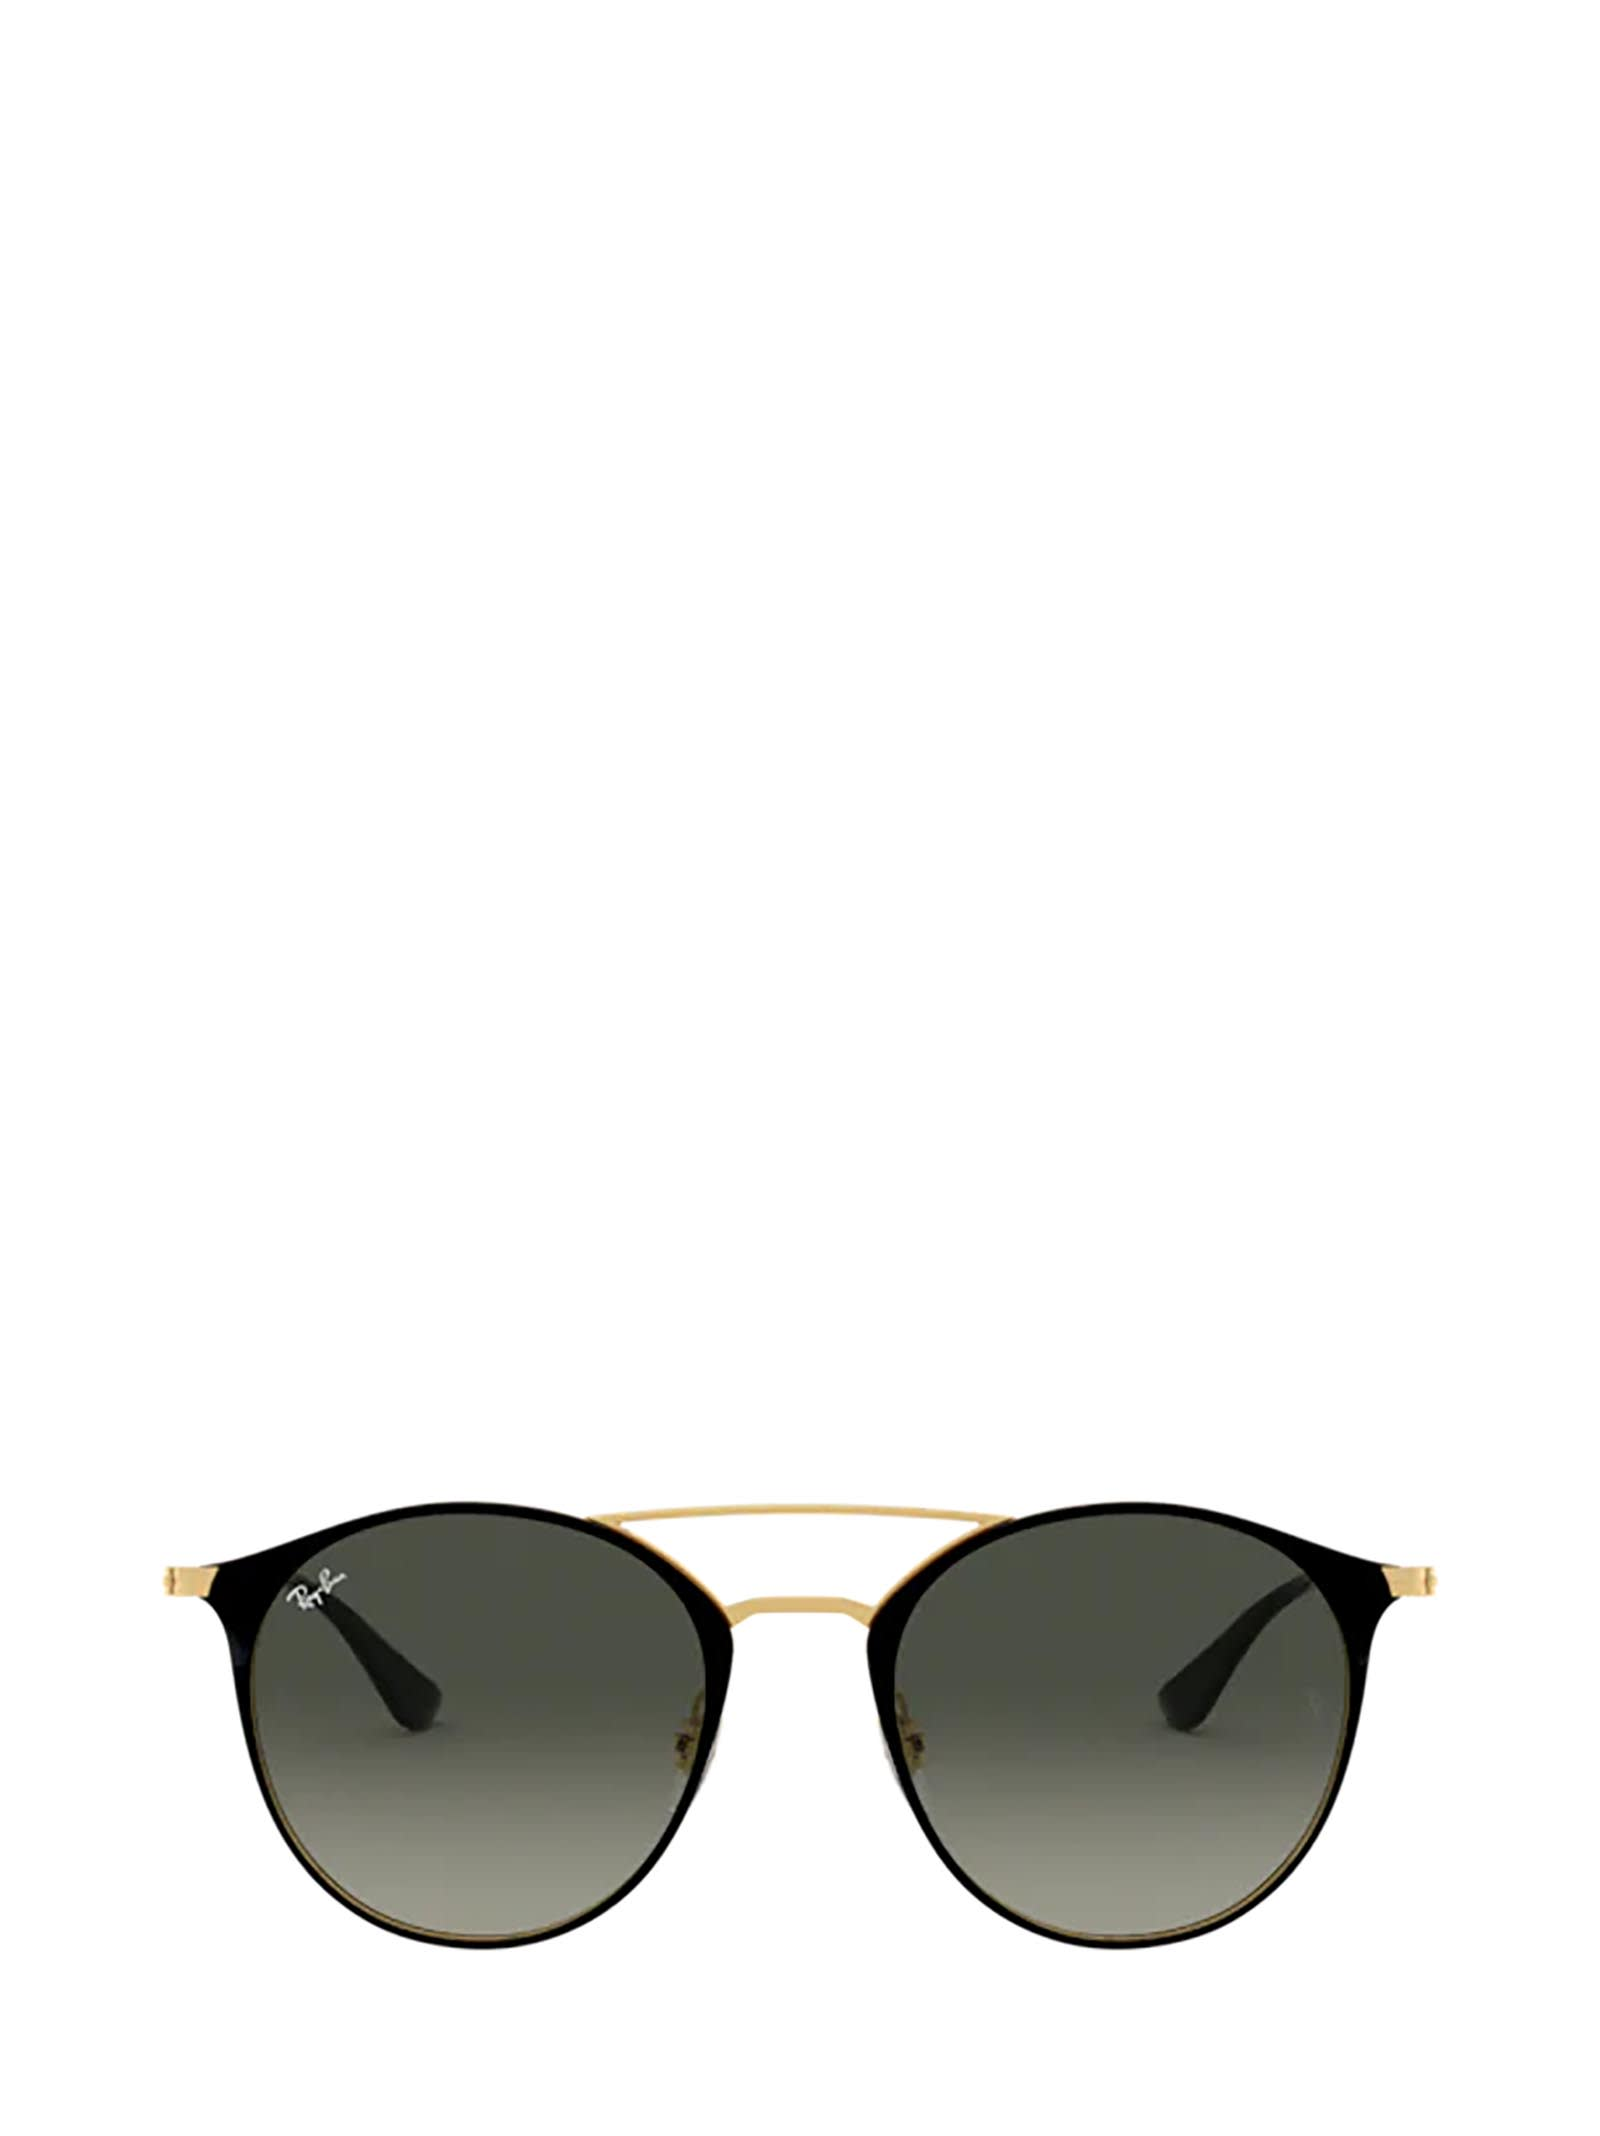 Ray-Ban Ray-ban Rb3546 Black On Arista Sunglasses